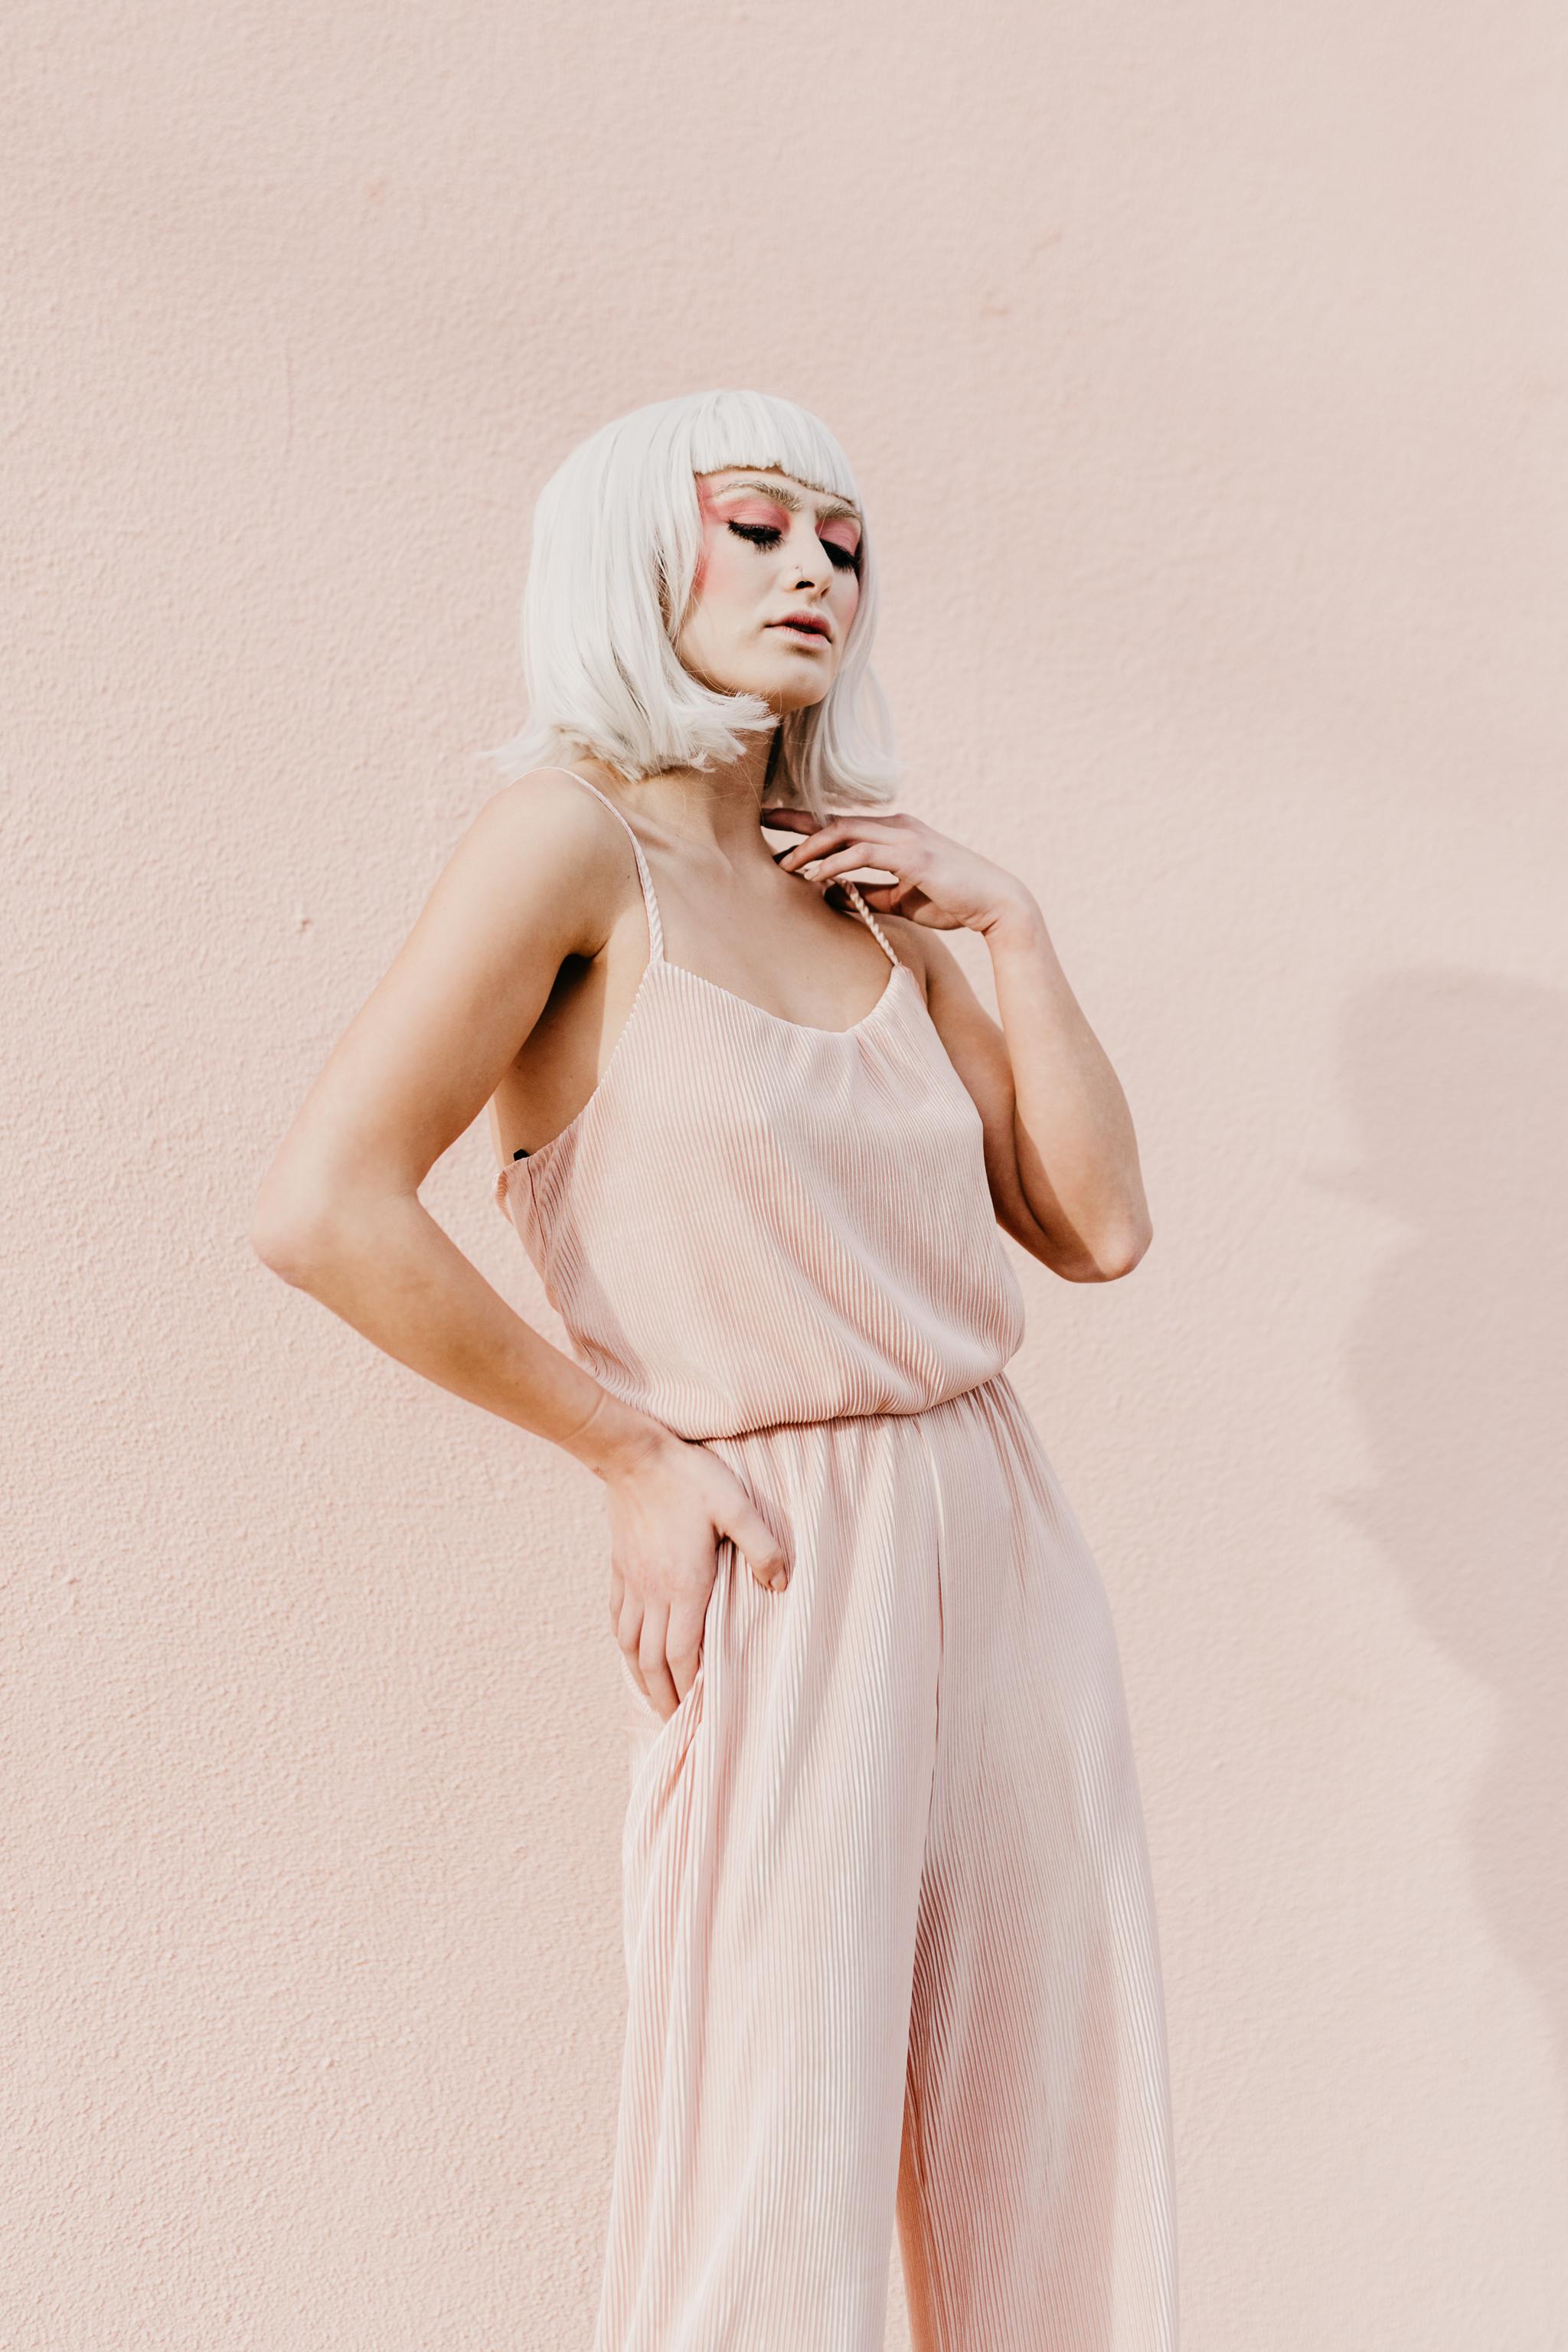 Heidi-toevs-editorial-photographer-san-luis-obispo-california